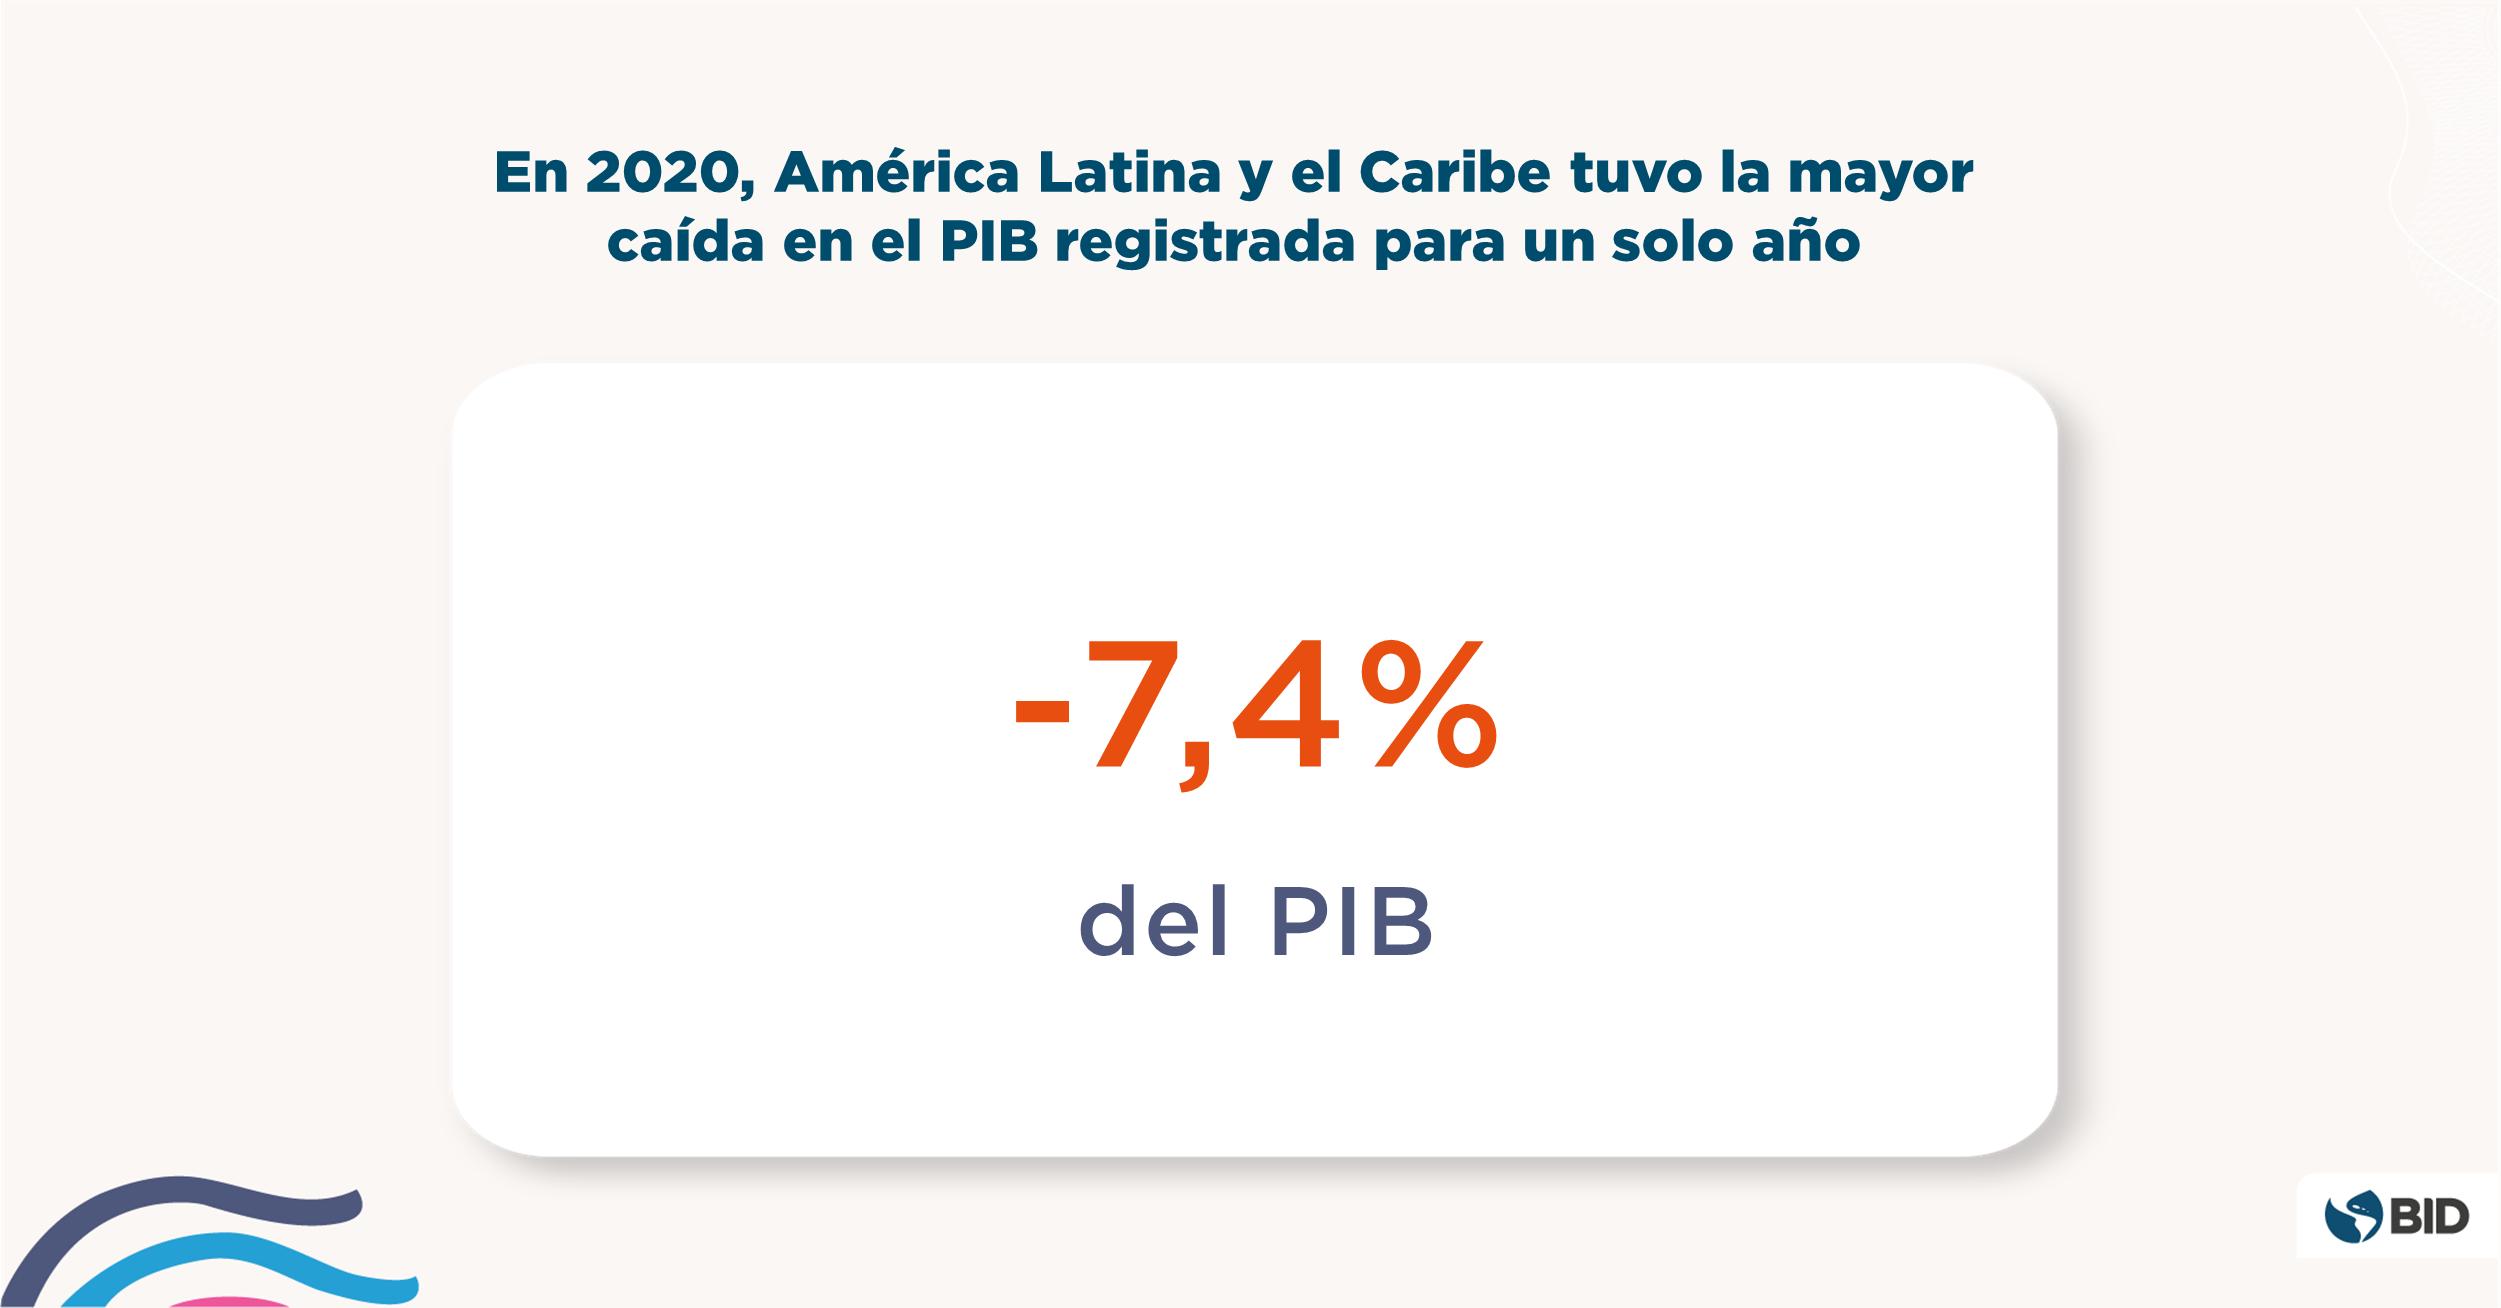 Informe Macroeconomico America Latina Caribe 2021 - Caida del PIB